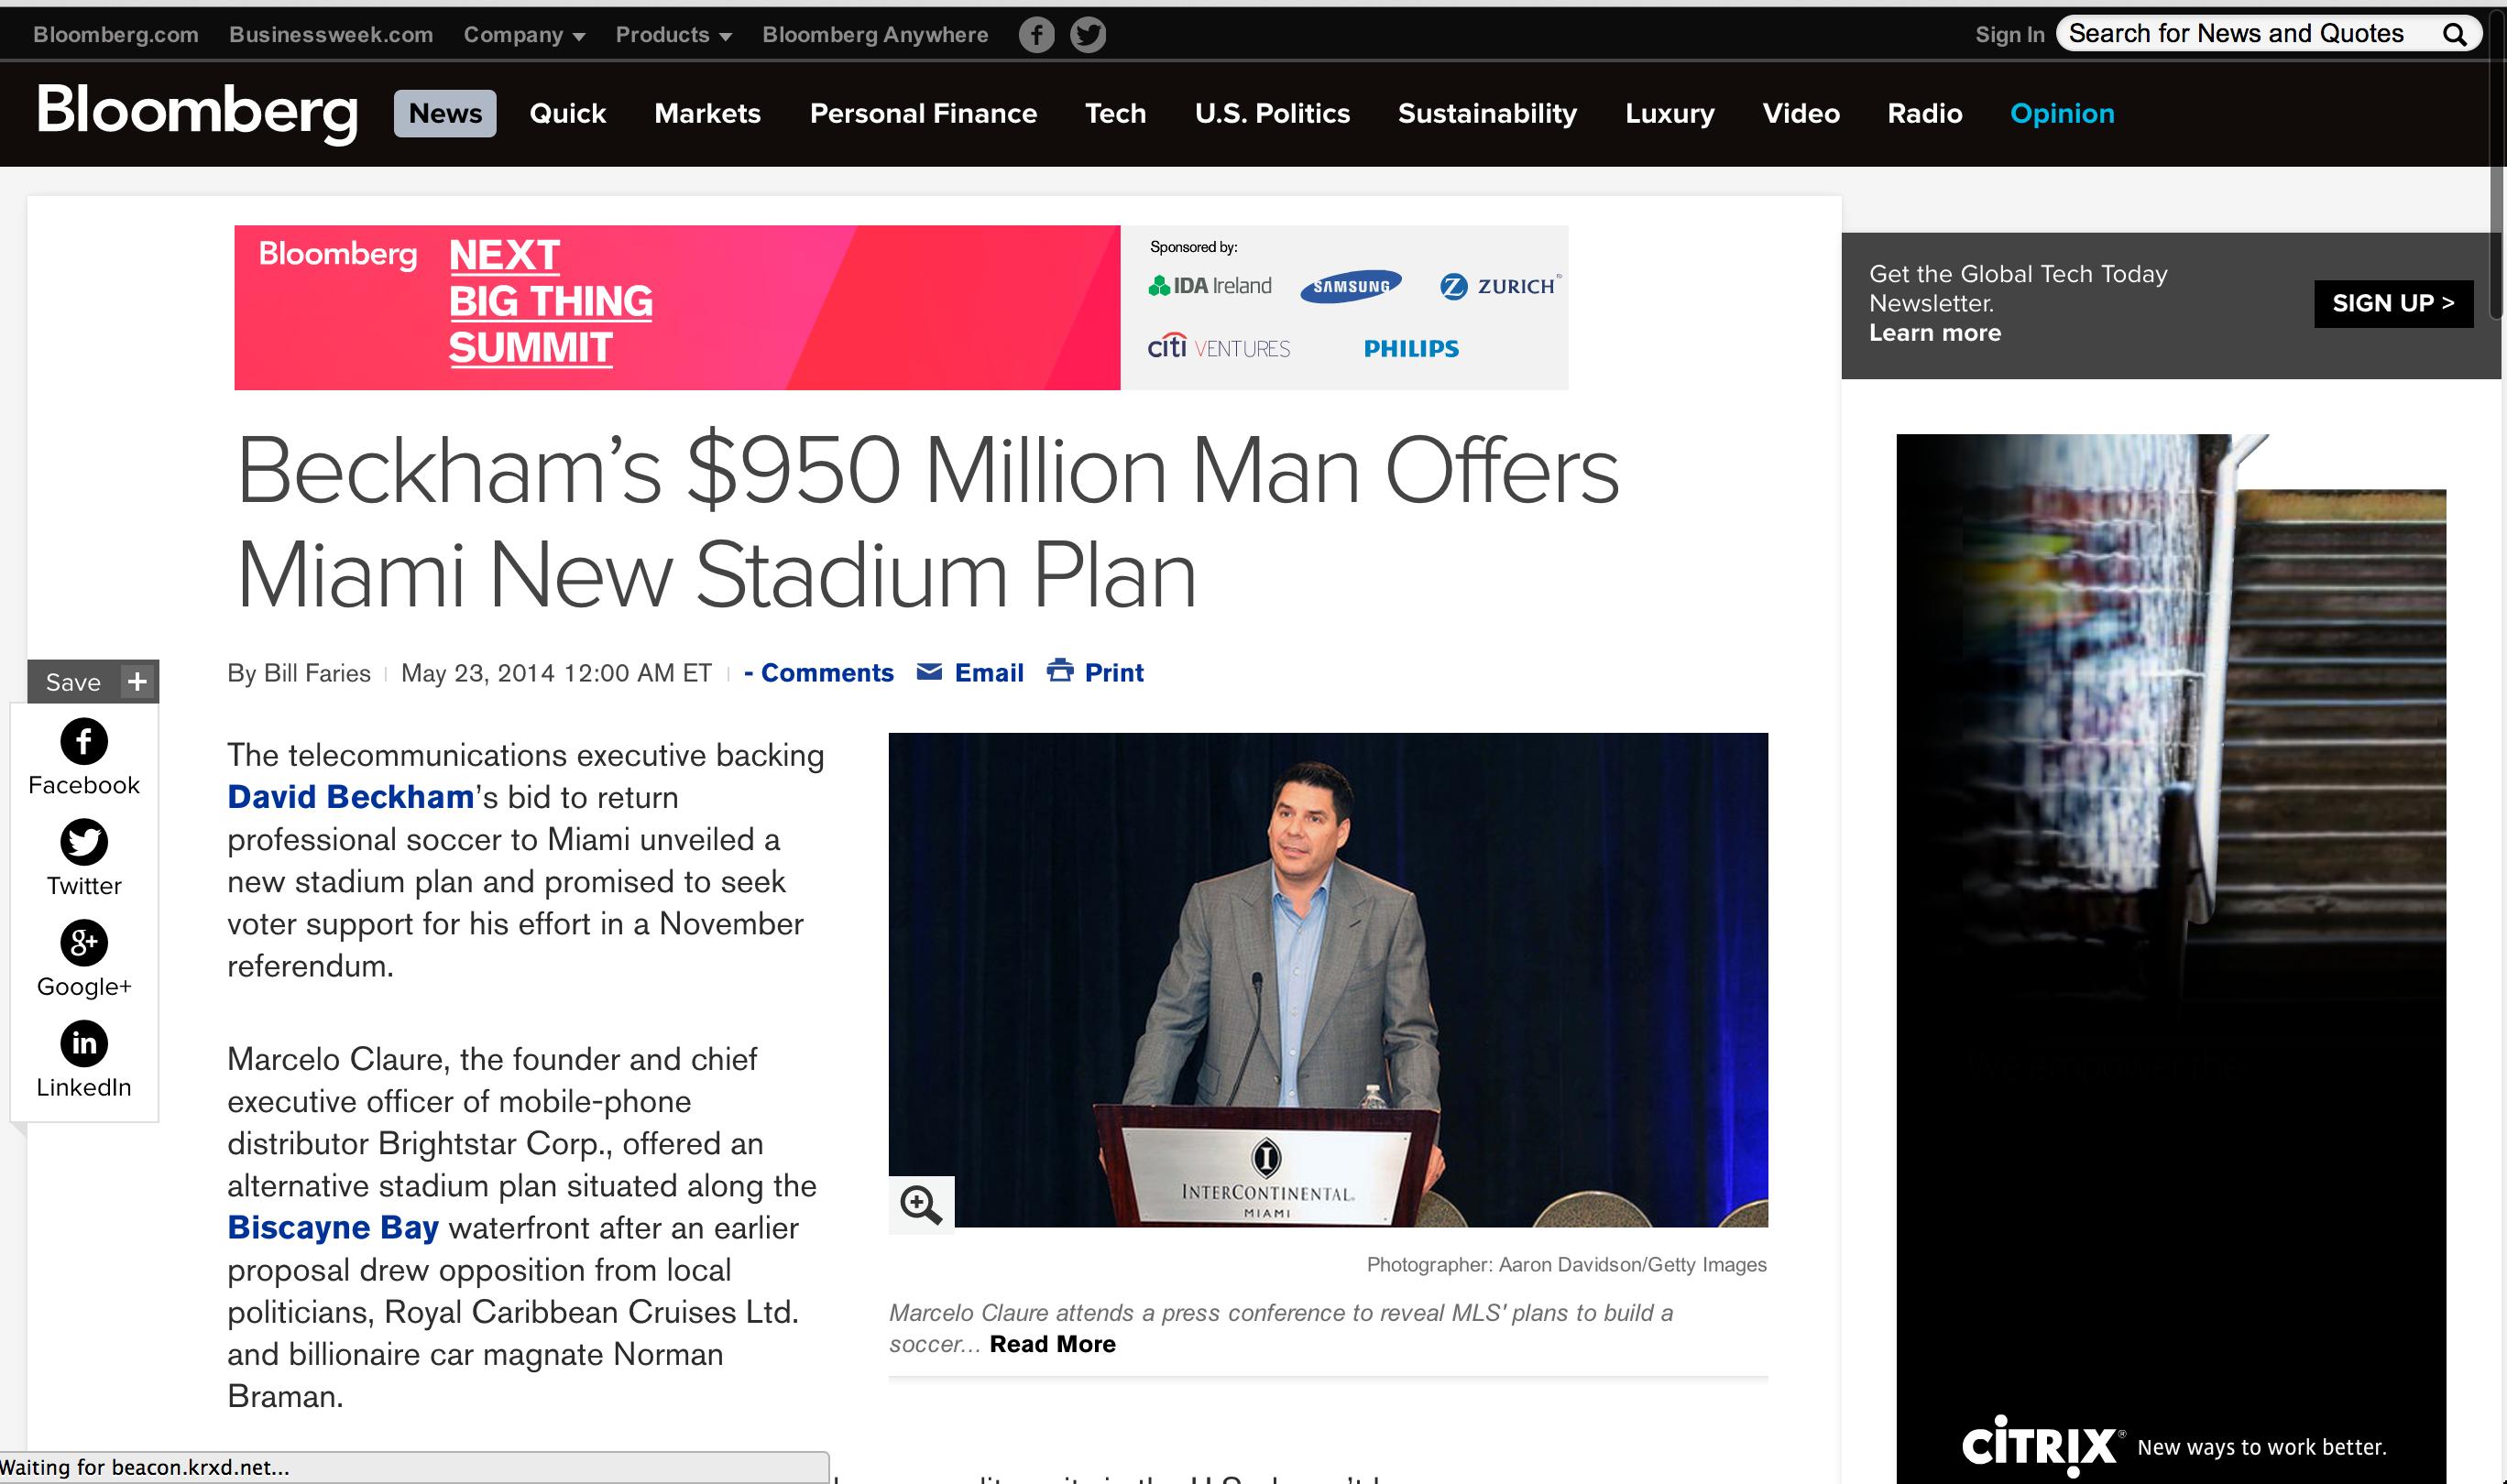 Bloomberg Beckham's $950 Million Man Offers Miami New Stadium Plan